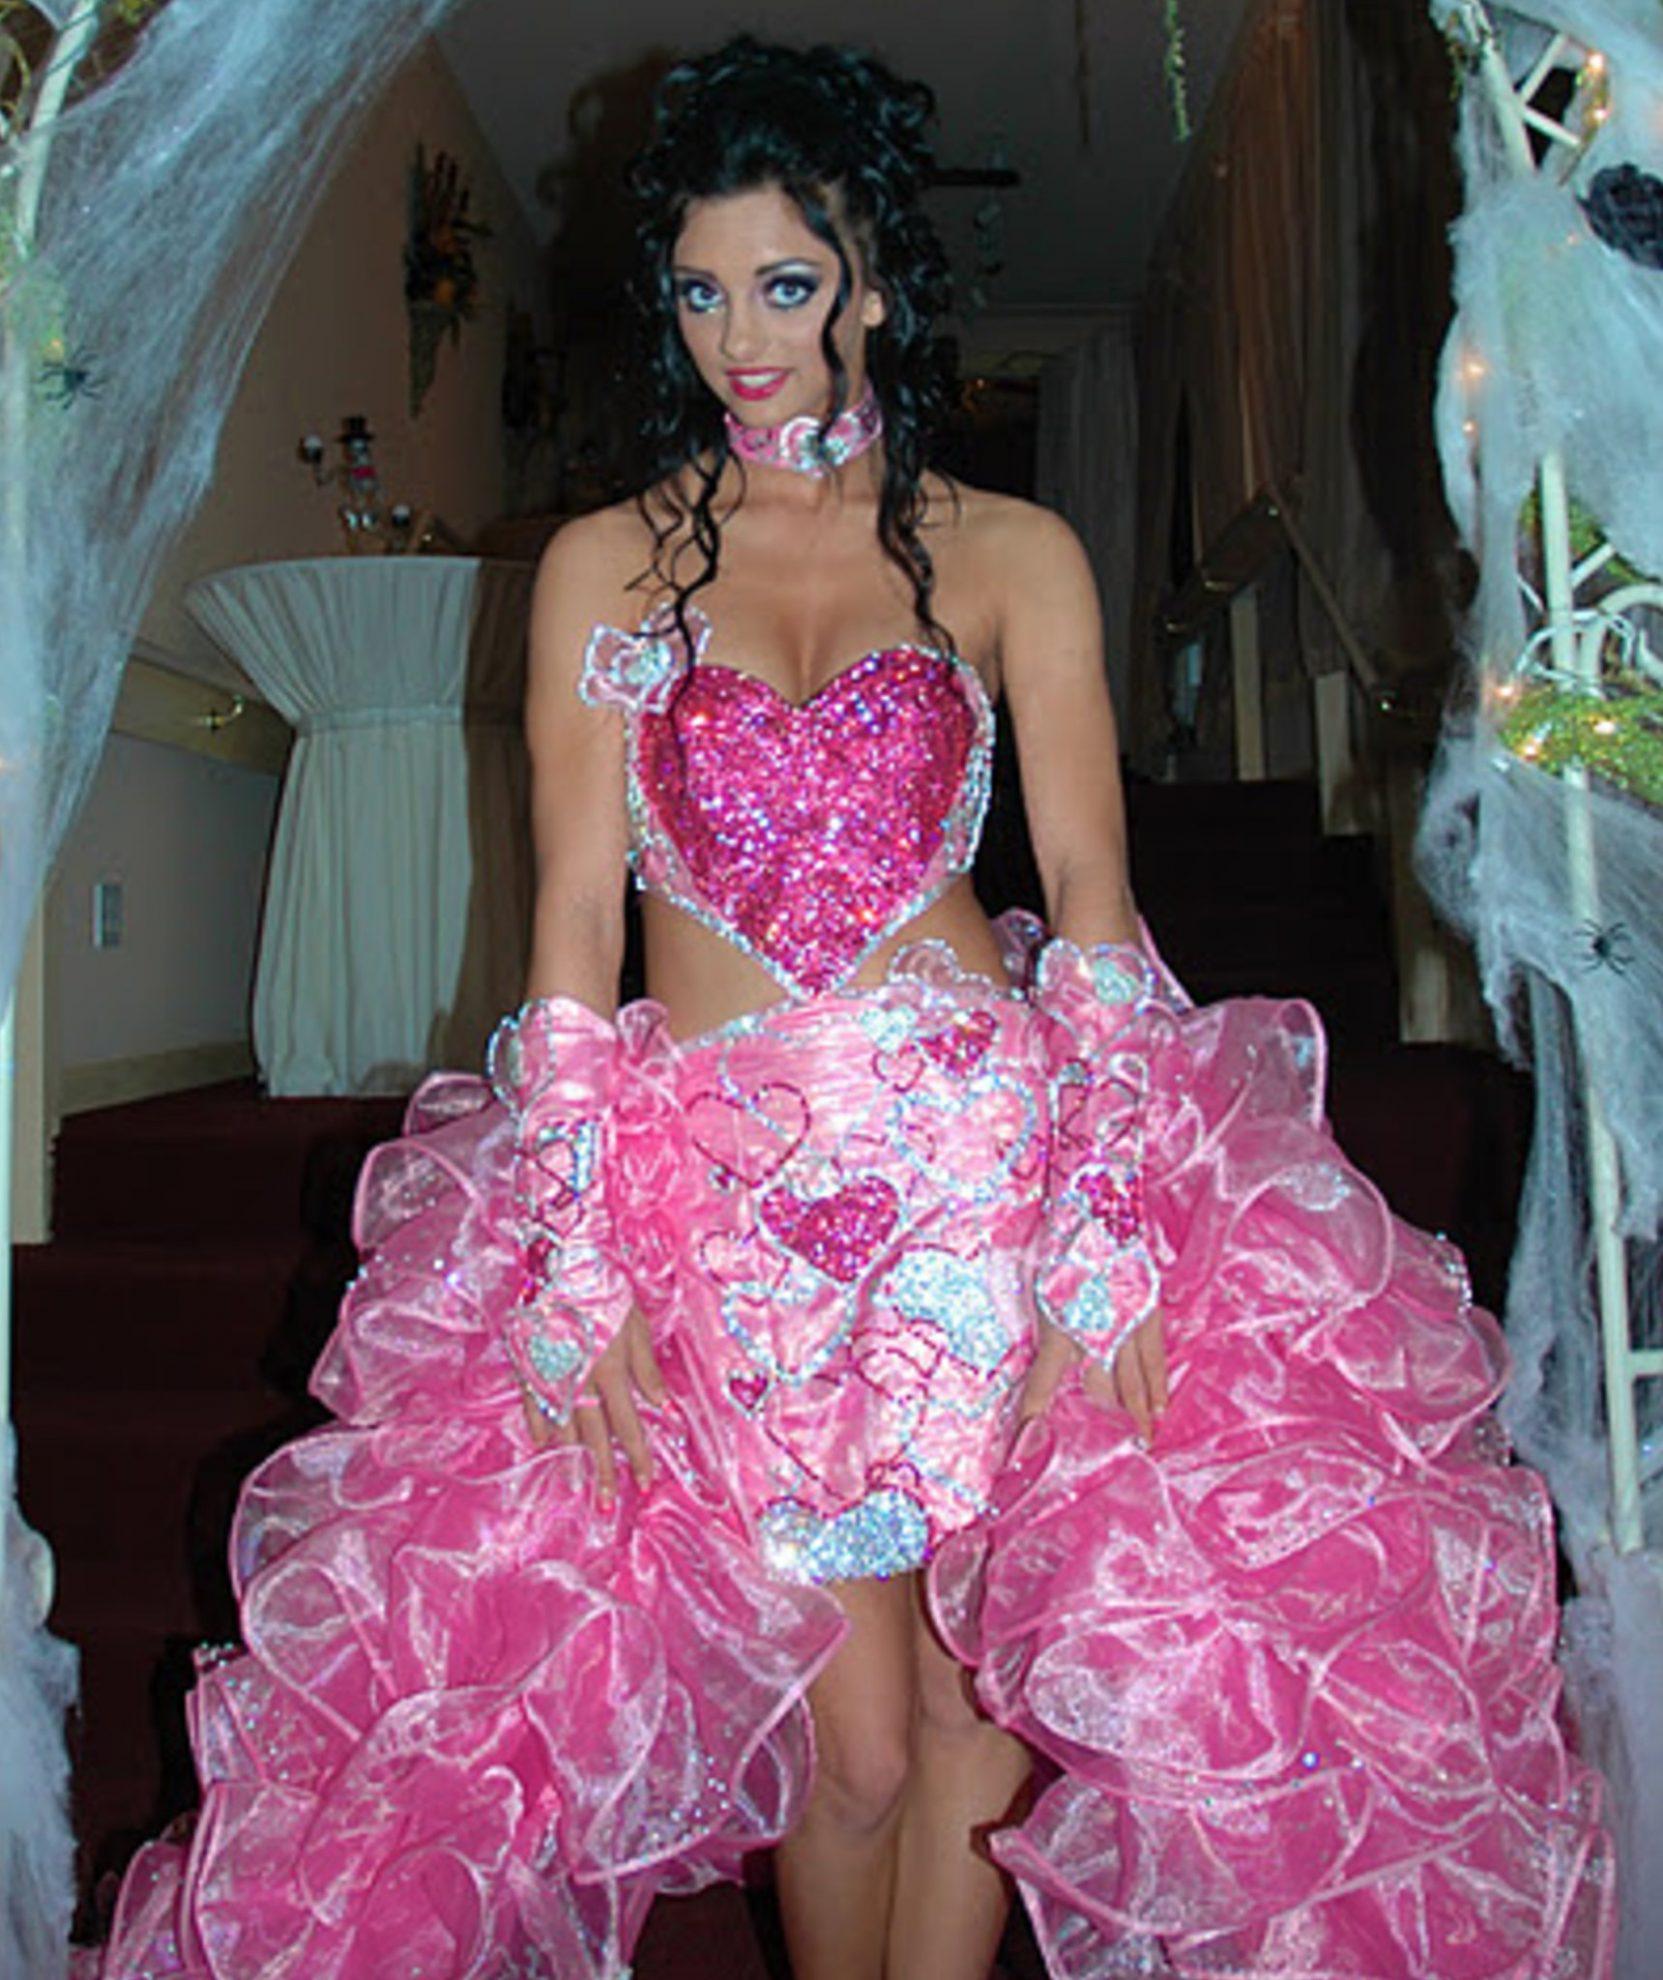 Craziest Wedding Ever: 14 Of The Weirdest Wedding Dresses Ever